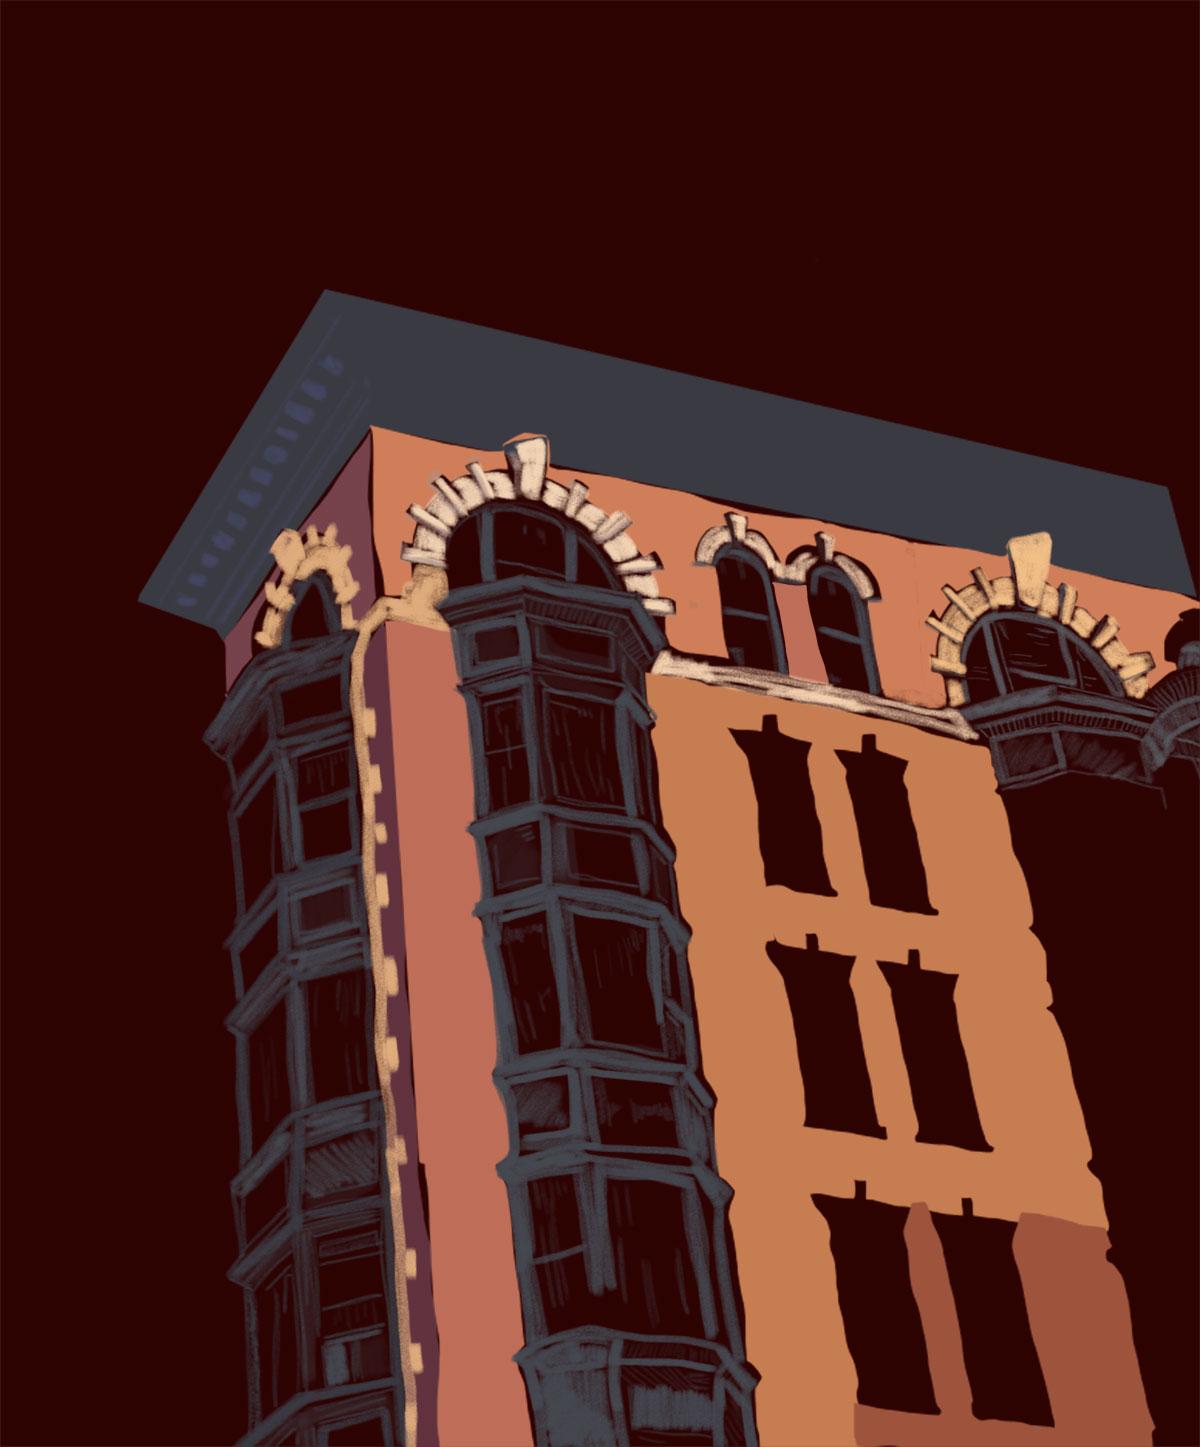 kfriedgen_city_building_november_2015